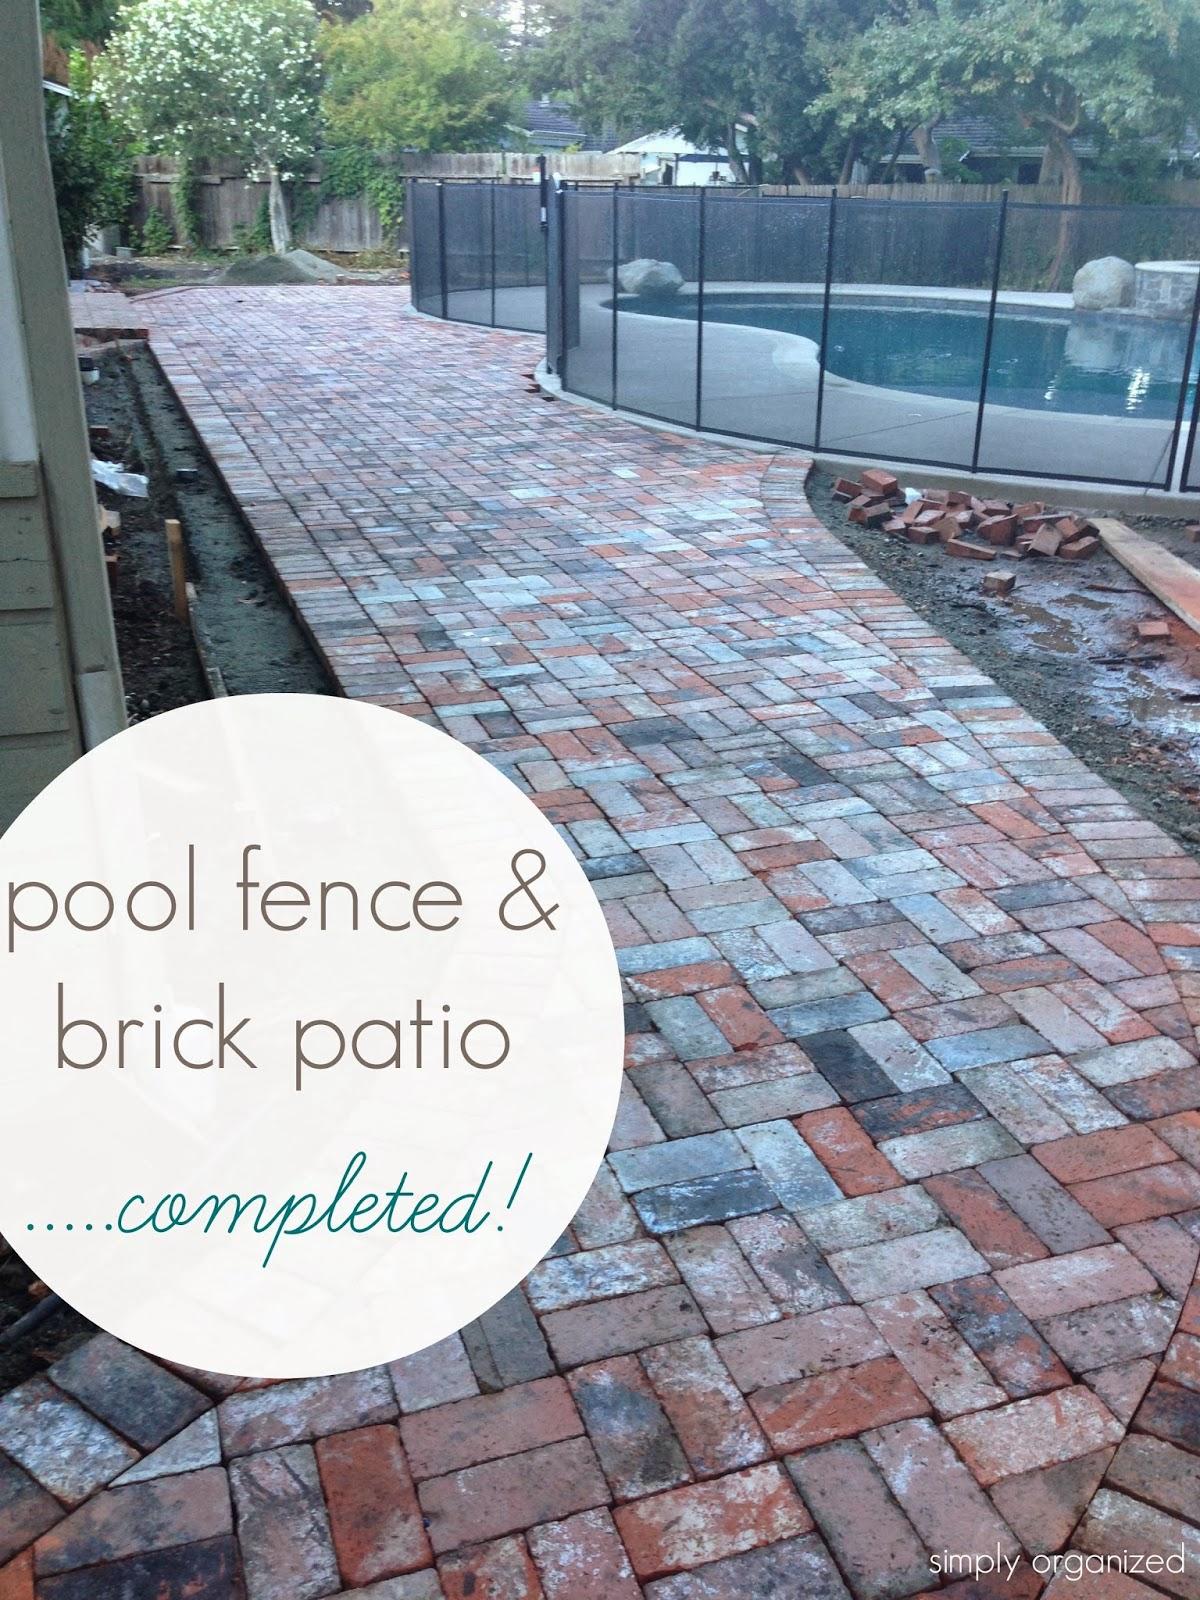 Simply Organized: Backyard Update: Pool Fence & Brick